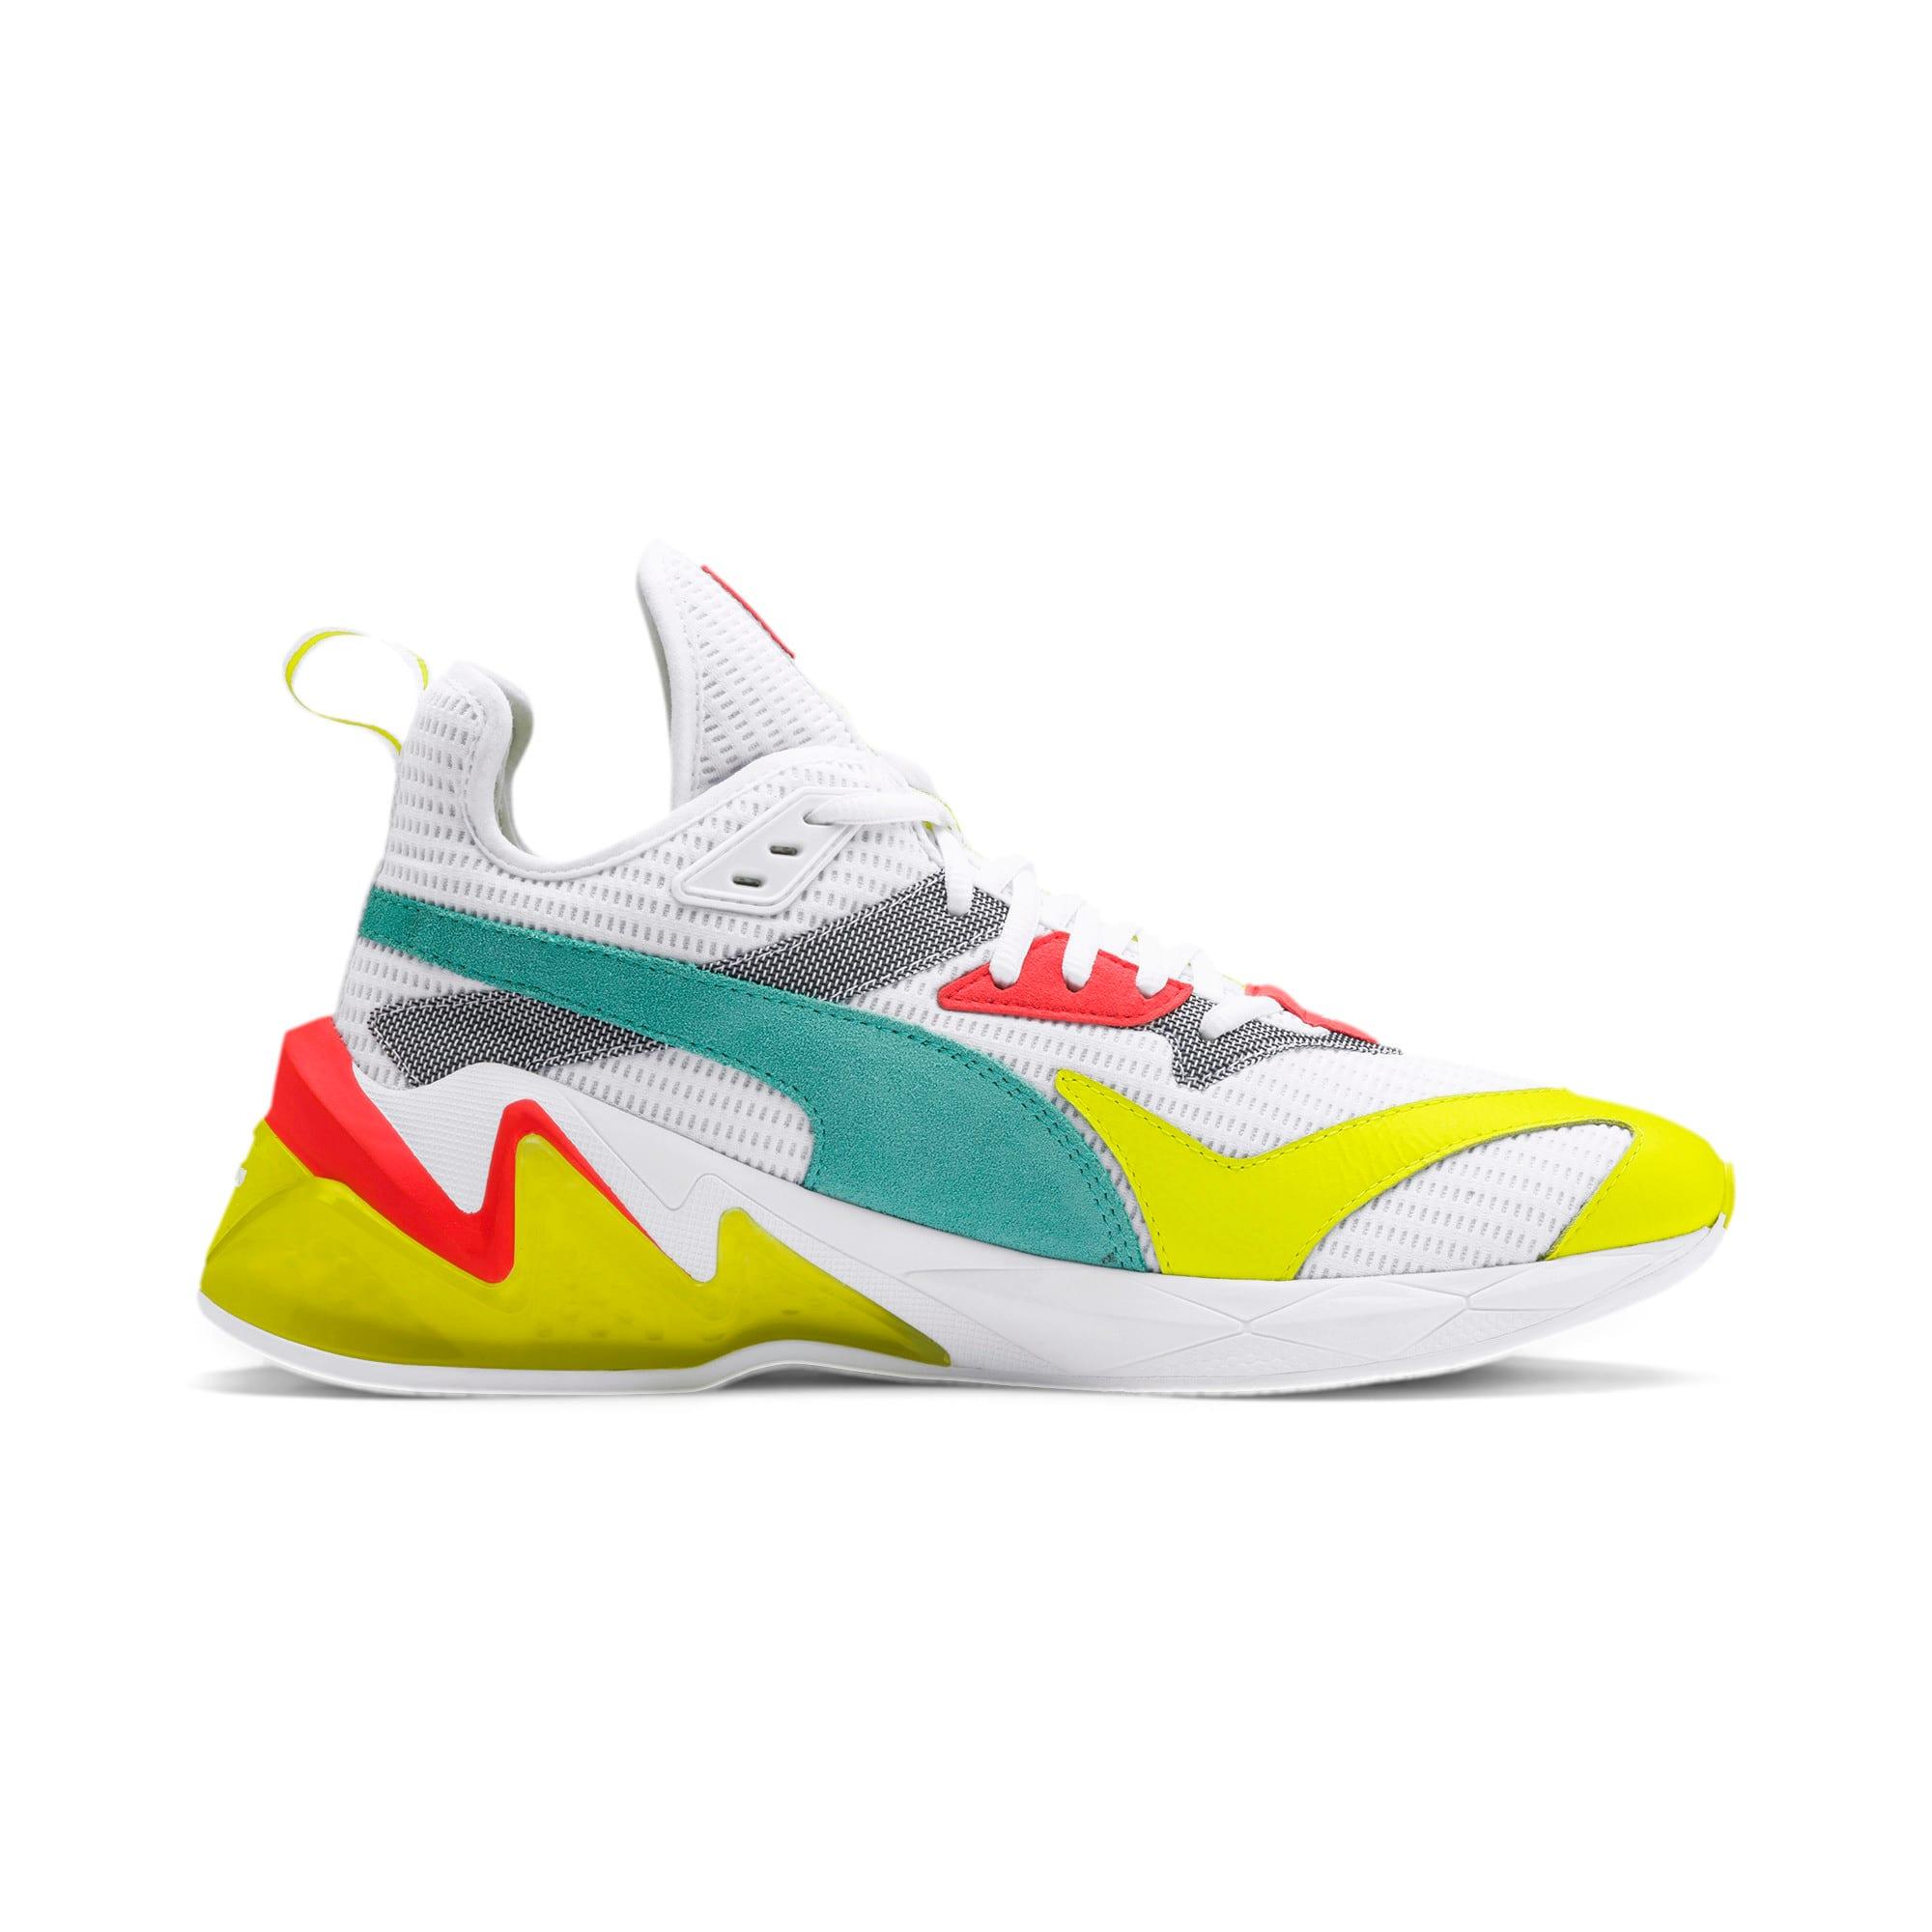 Miniatura 6 de Zapatos de entrenamientoLQDCELL Origin para hombre, Puma White-Yellow Alert, mediano